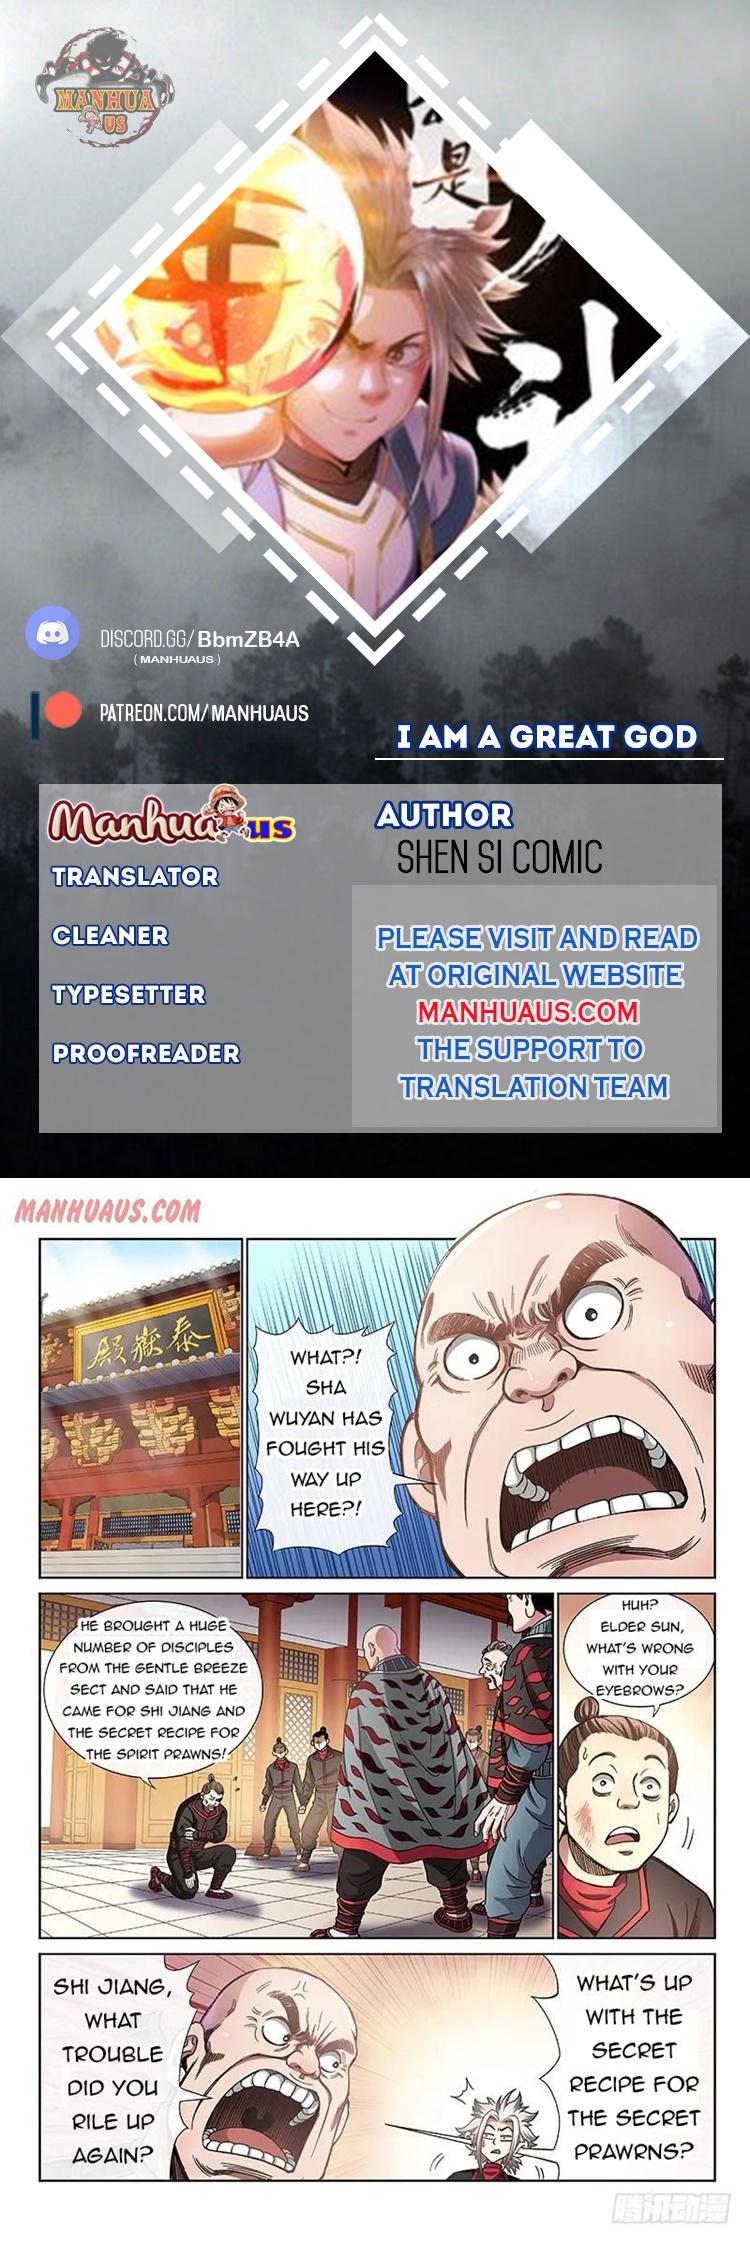 https://manga.mangadogs.com/comics/pic4/4/21124/2823098/2b6921f2c64dee16ba21ebf17f3c2c92.jpg Page 1